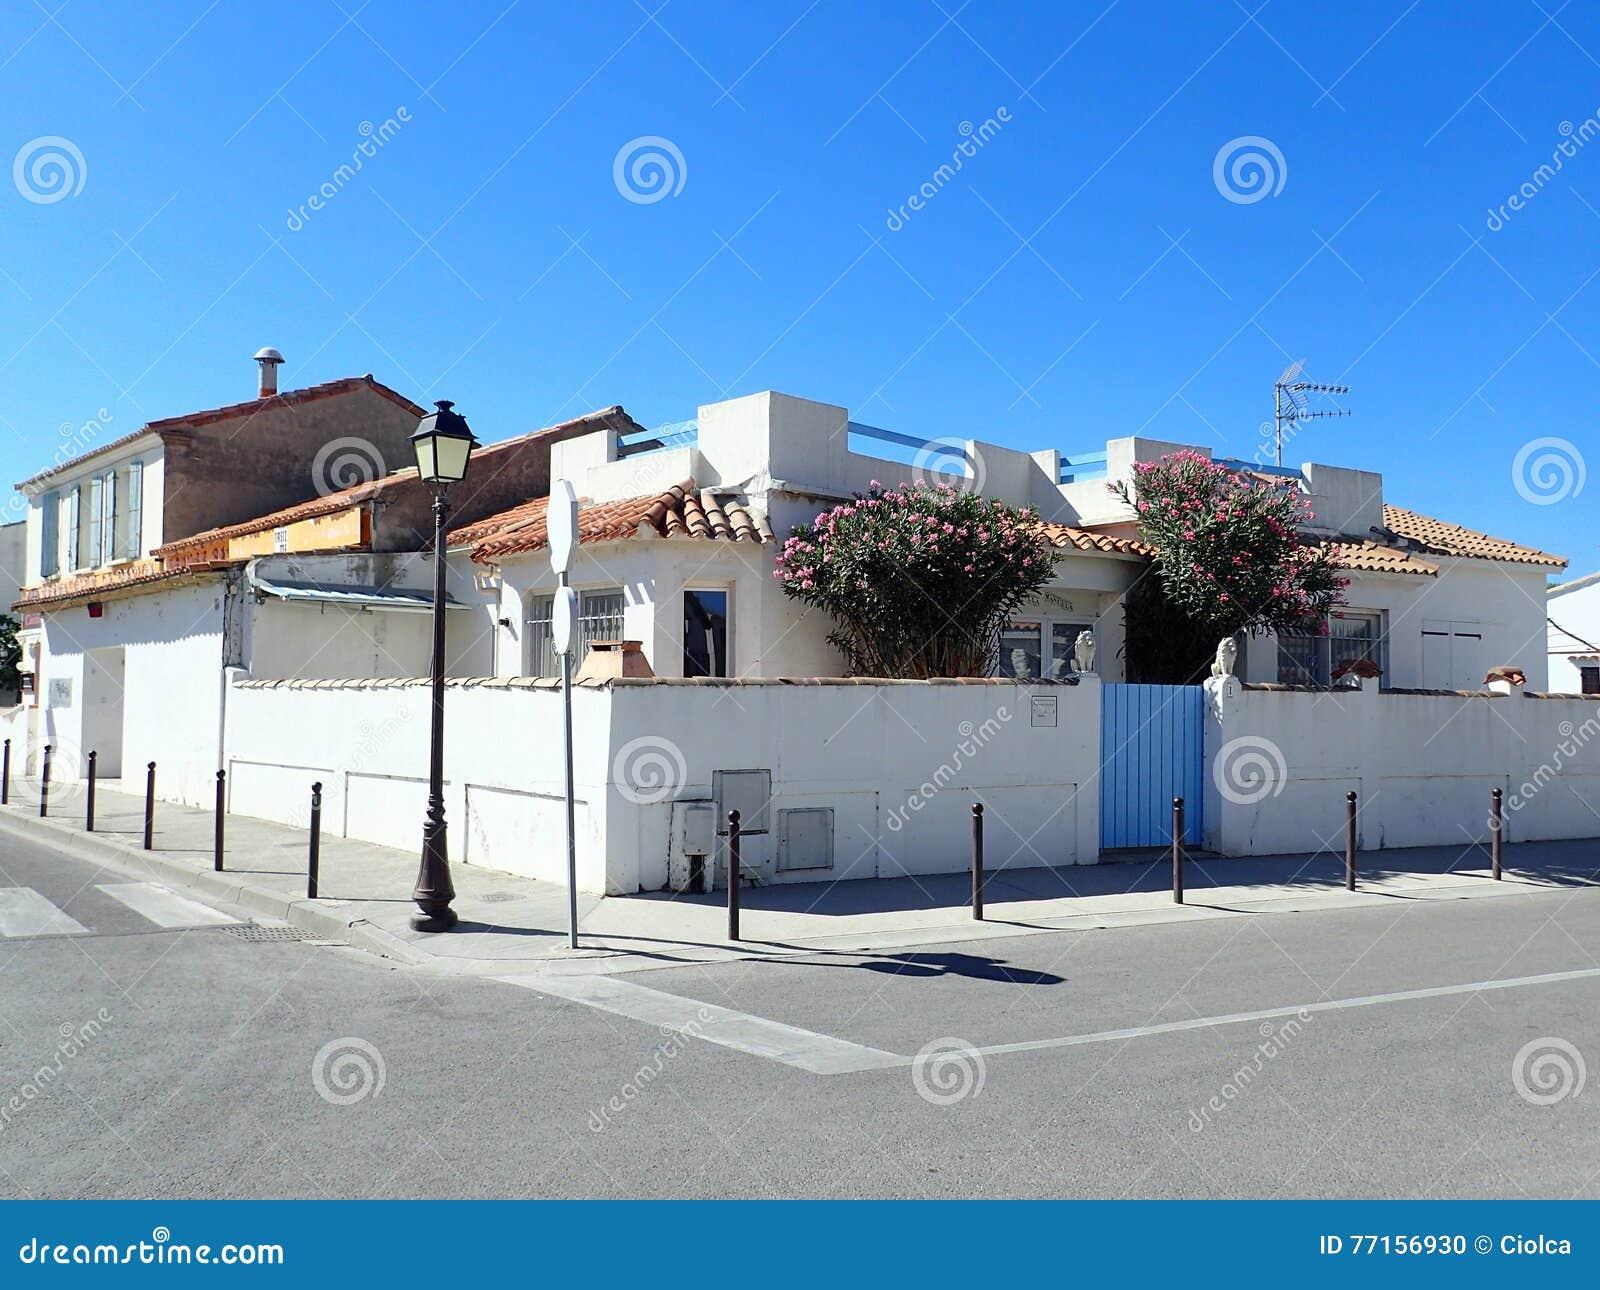 Chambre dans le Saintes-Maries-de-la-Mer, France